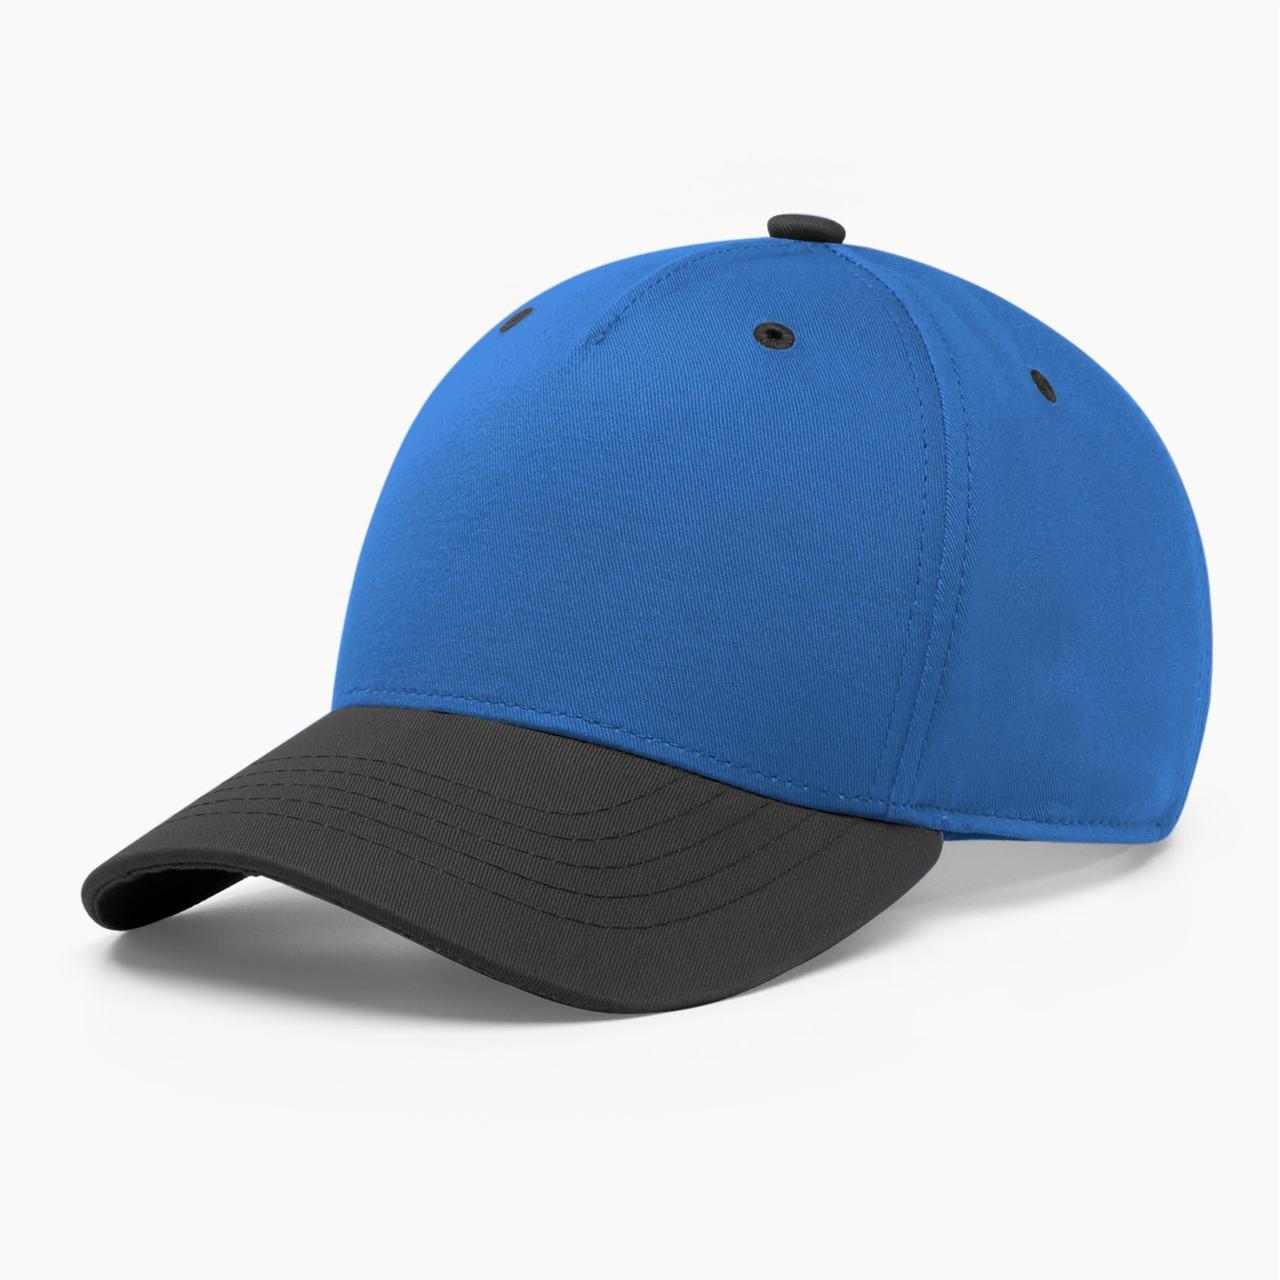 Бейсболка без логотипа INAL basic S / 53-54 RU Синий 287053